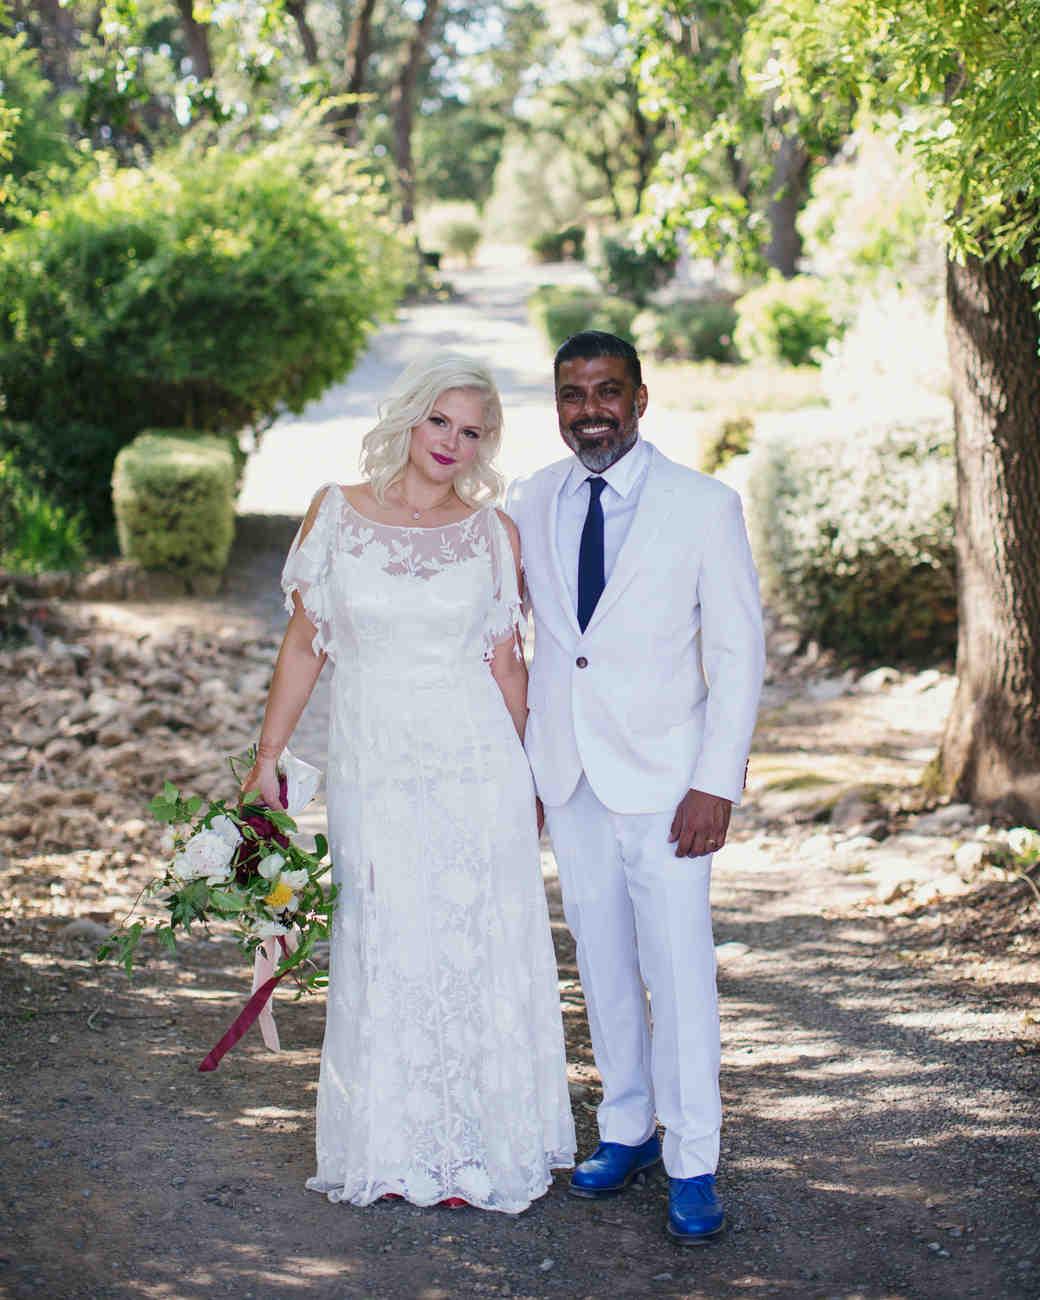 rosie-ambi-wedding-couple-4959-s112501-0116.jpg